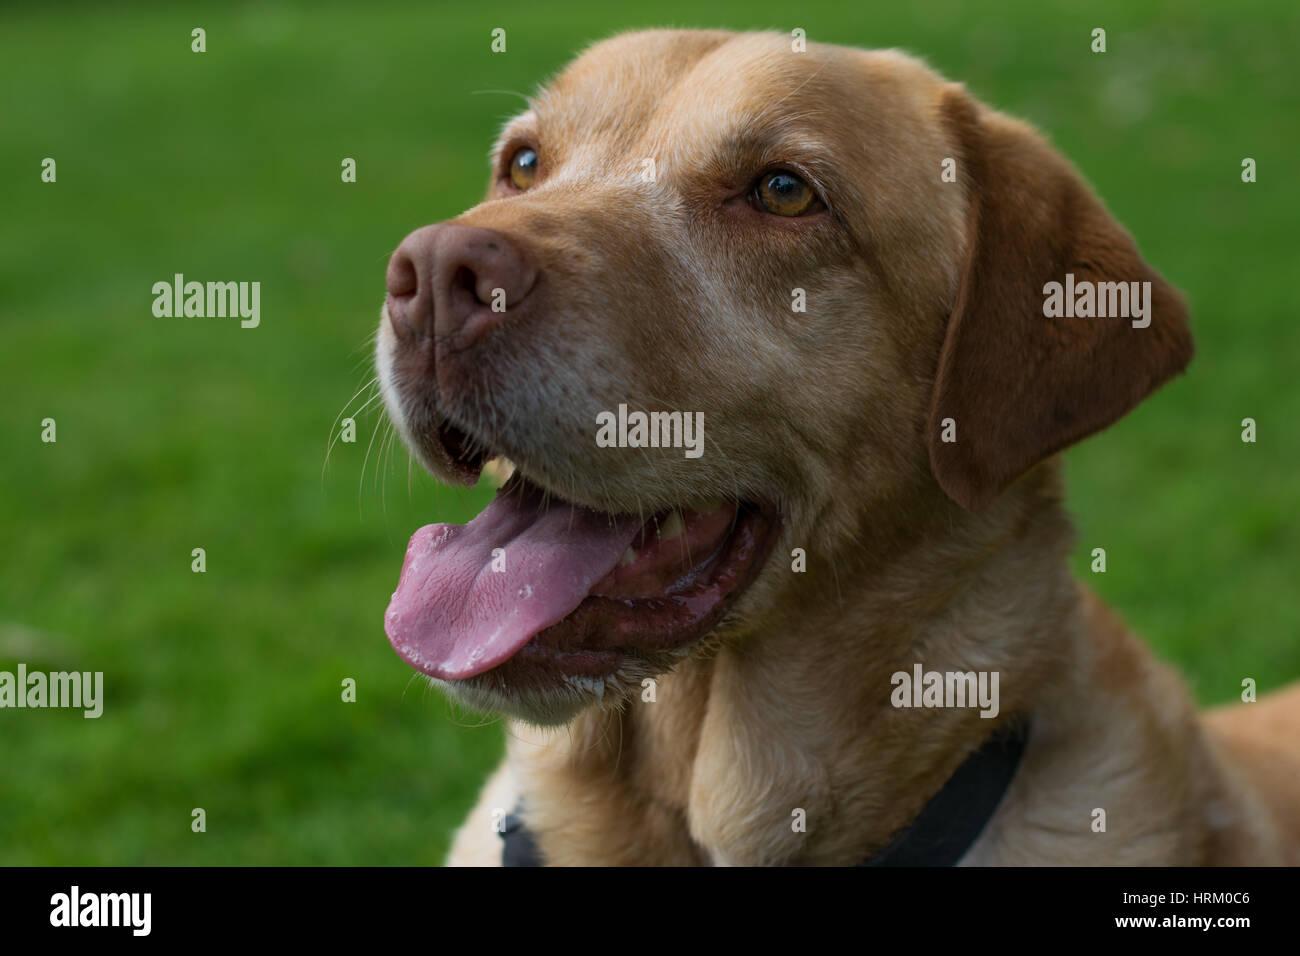 Panting labrador - Stock Image